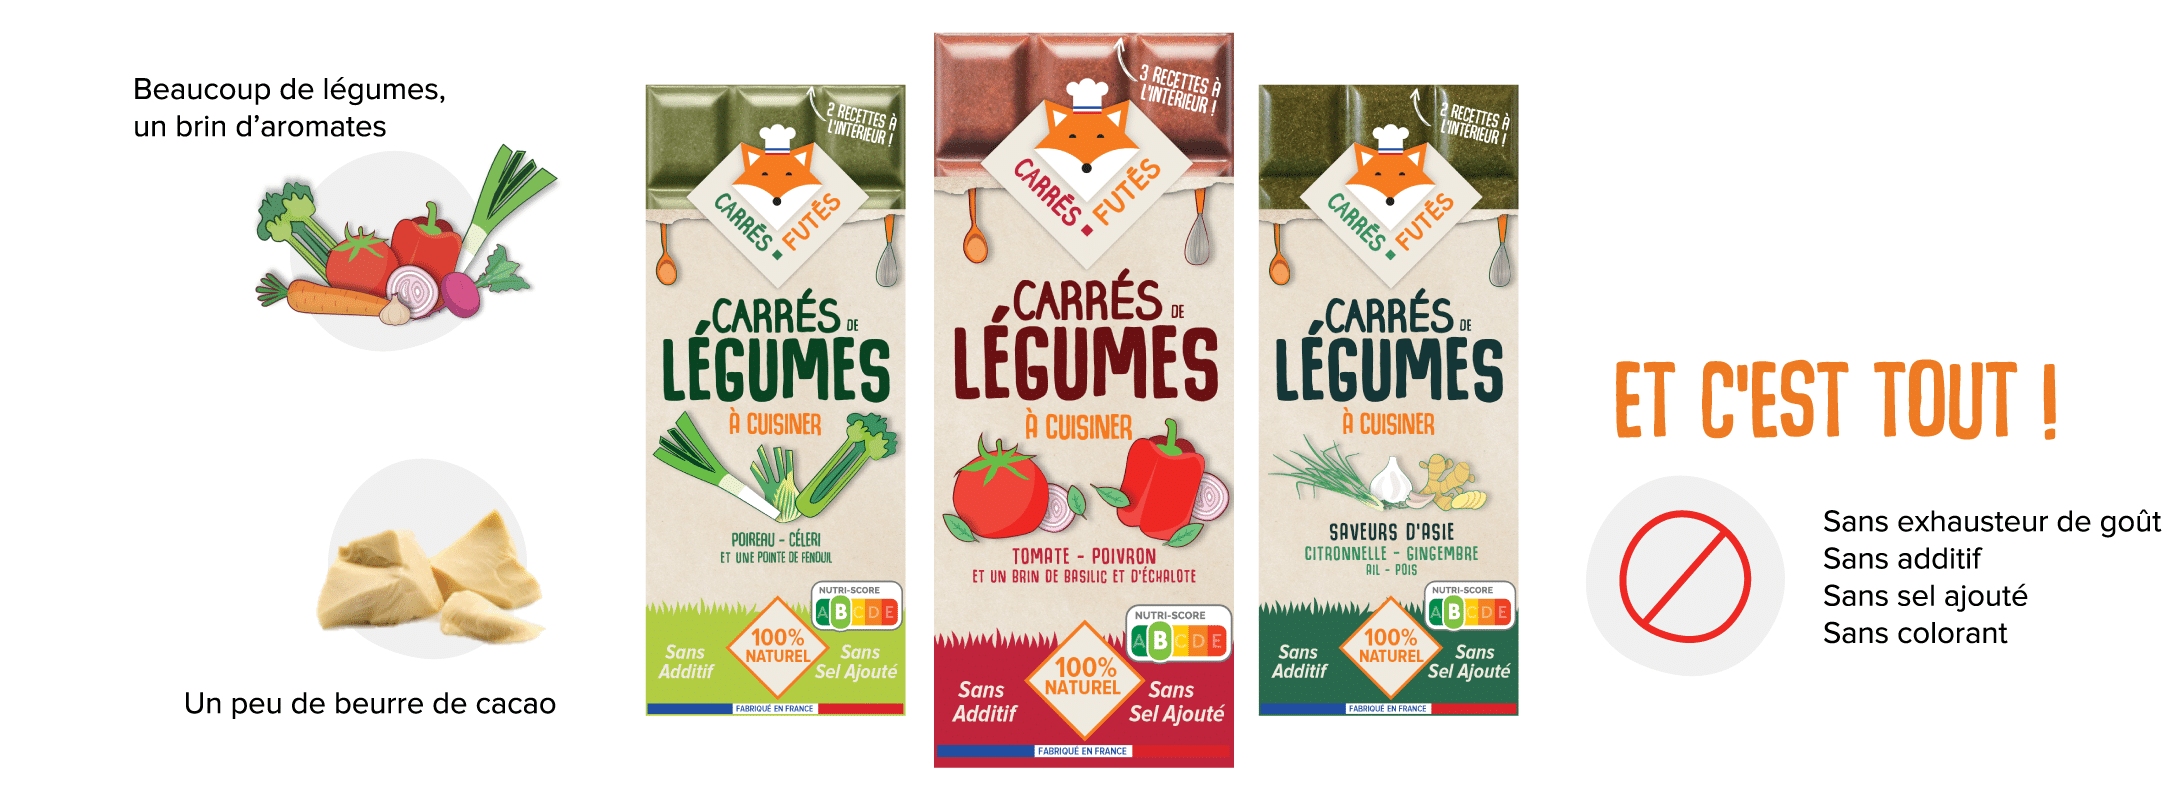 nos-produits-tablettes-de-legumes-carres-futes-innovation